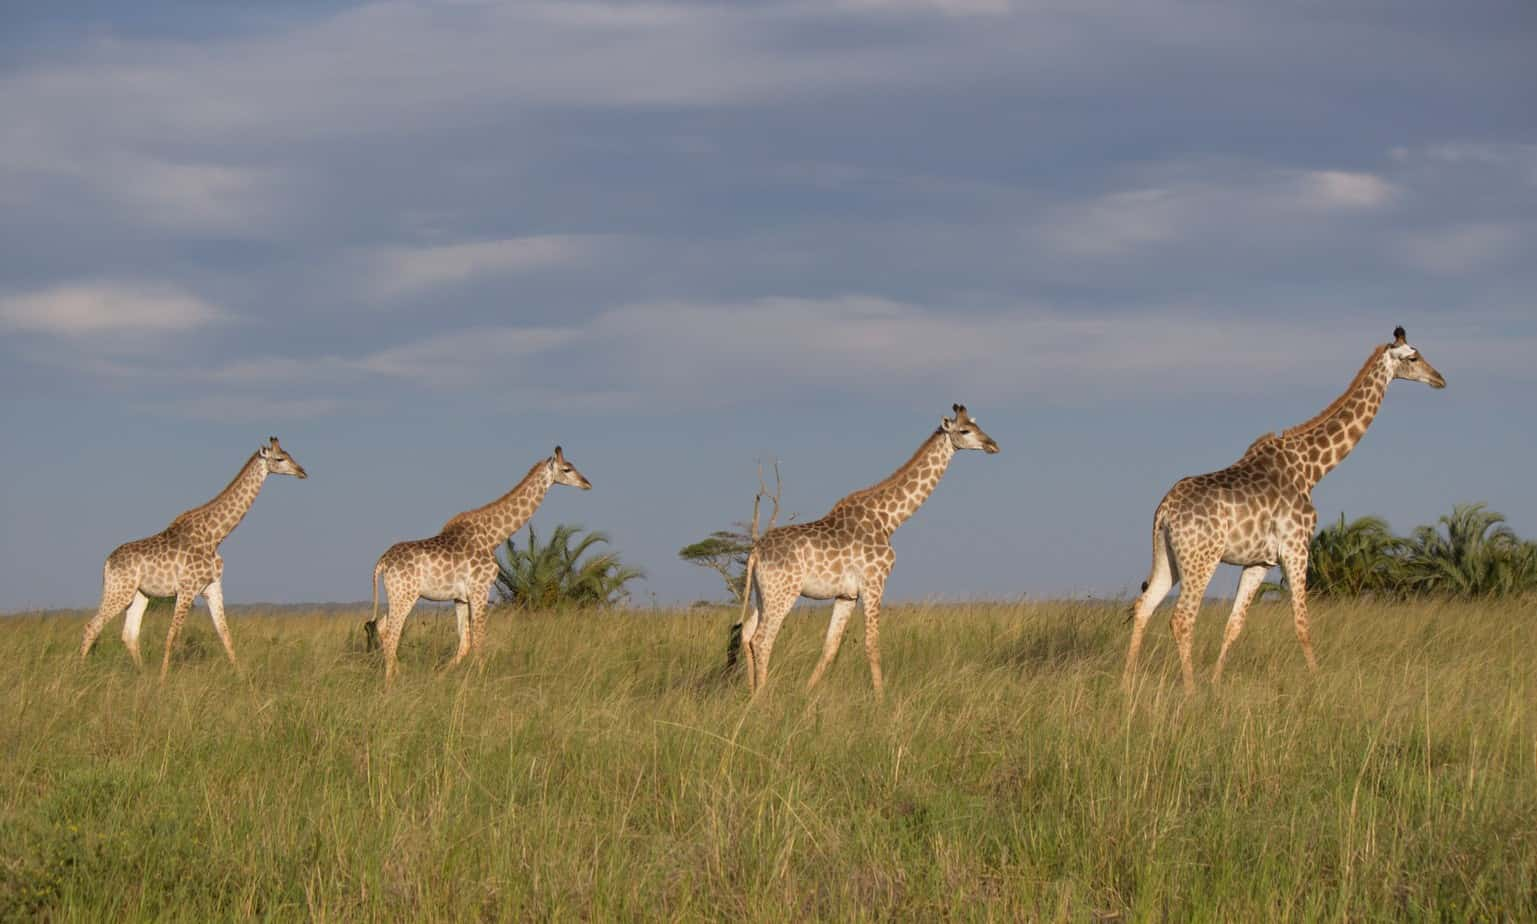 South African Giraffe @ Western Shores - iSimangaliso Wetland Park. Photo: Håvard Rosenlund